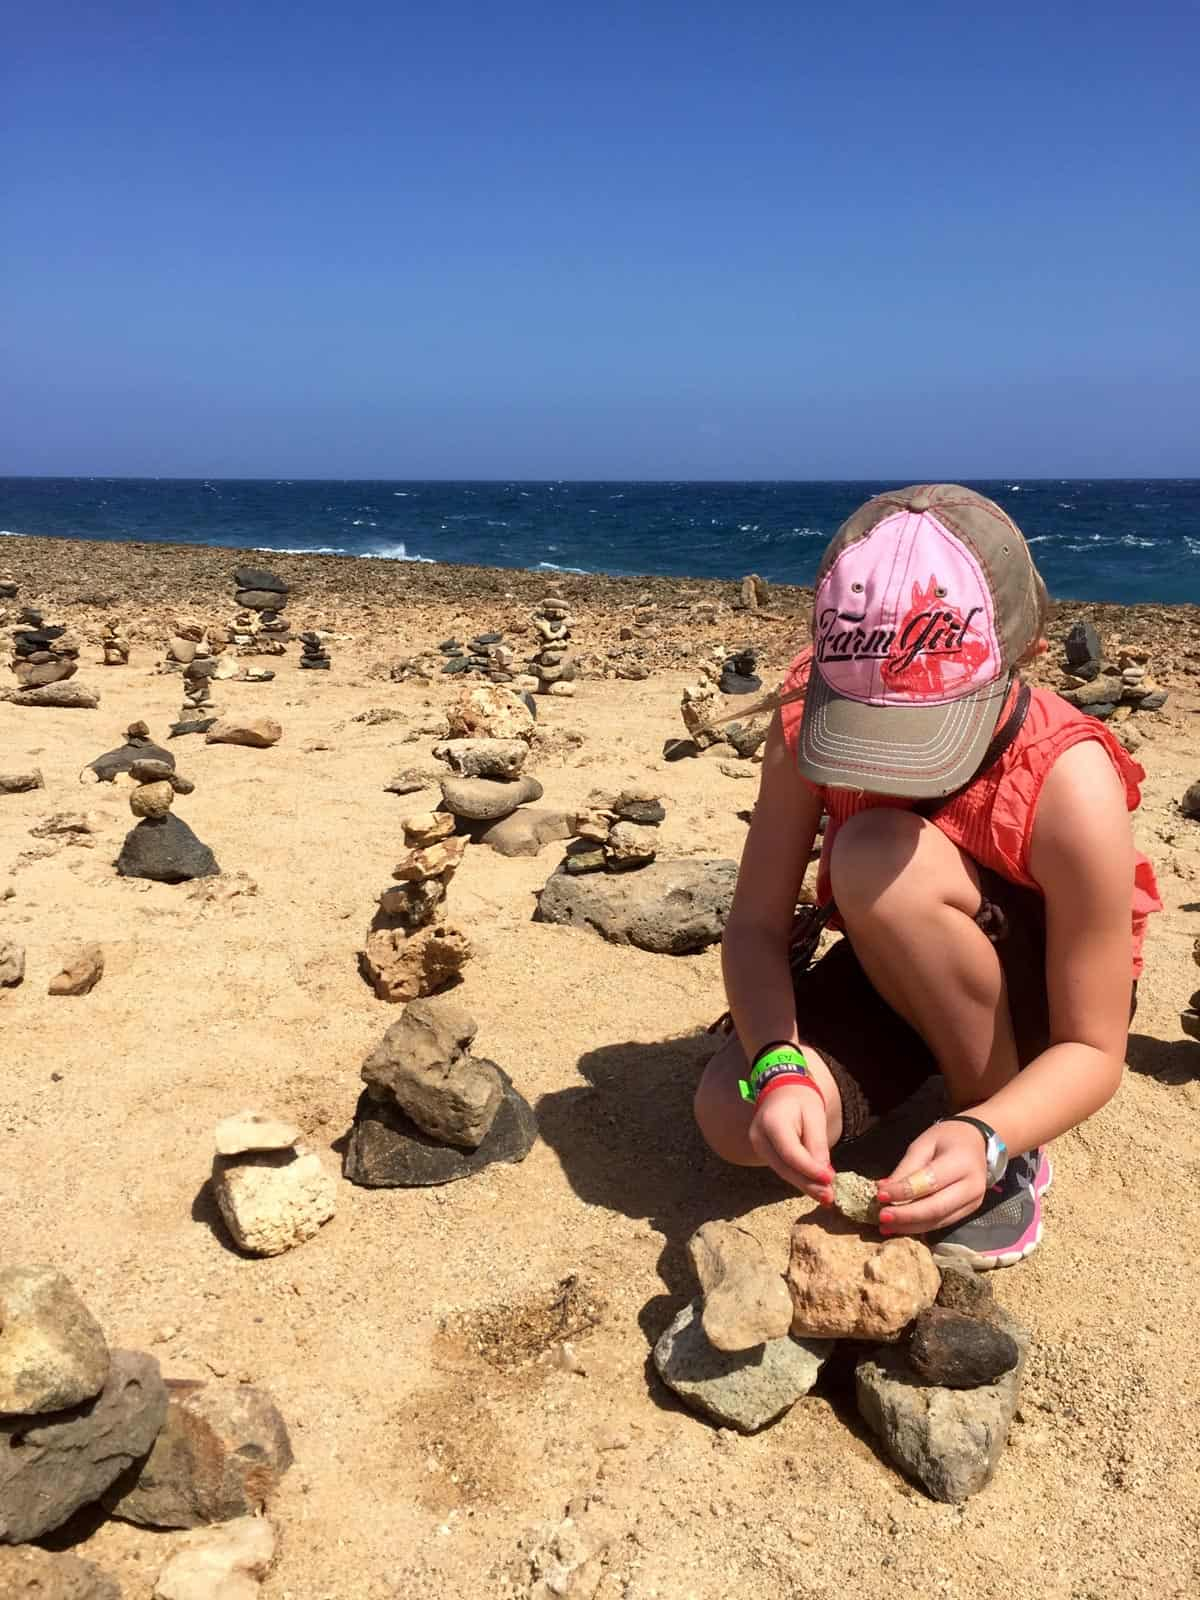 Aruba Island Tour (wishing rocks garden) from afarmgirlsdabbles.com